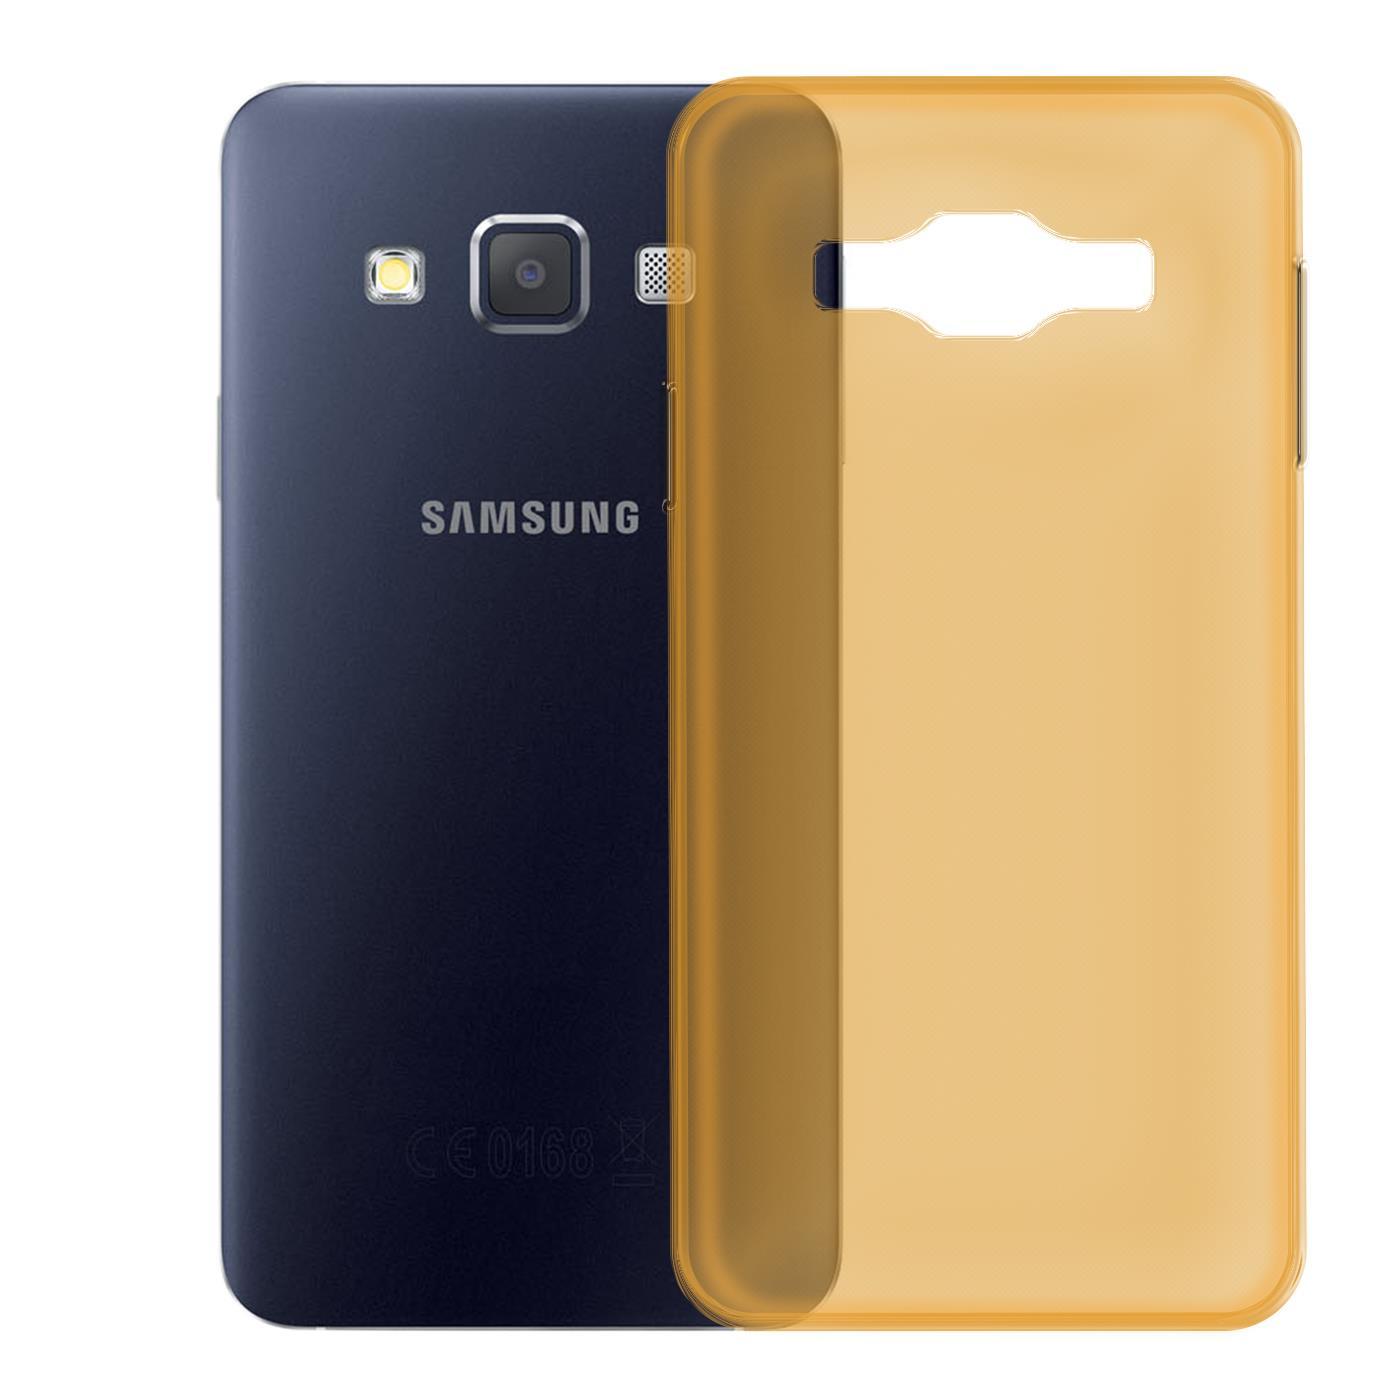 Samsung-Galaxy-A3-2015-Thin-Silicone-Clear-Case-Cover-Ultra-Slim-Shockproof-Gel Indexbild 14